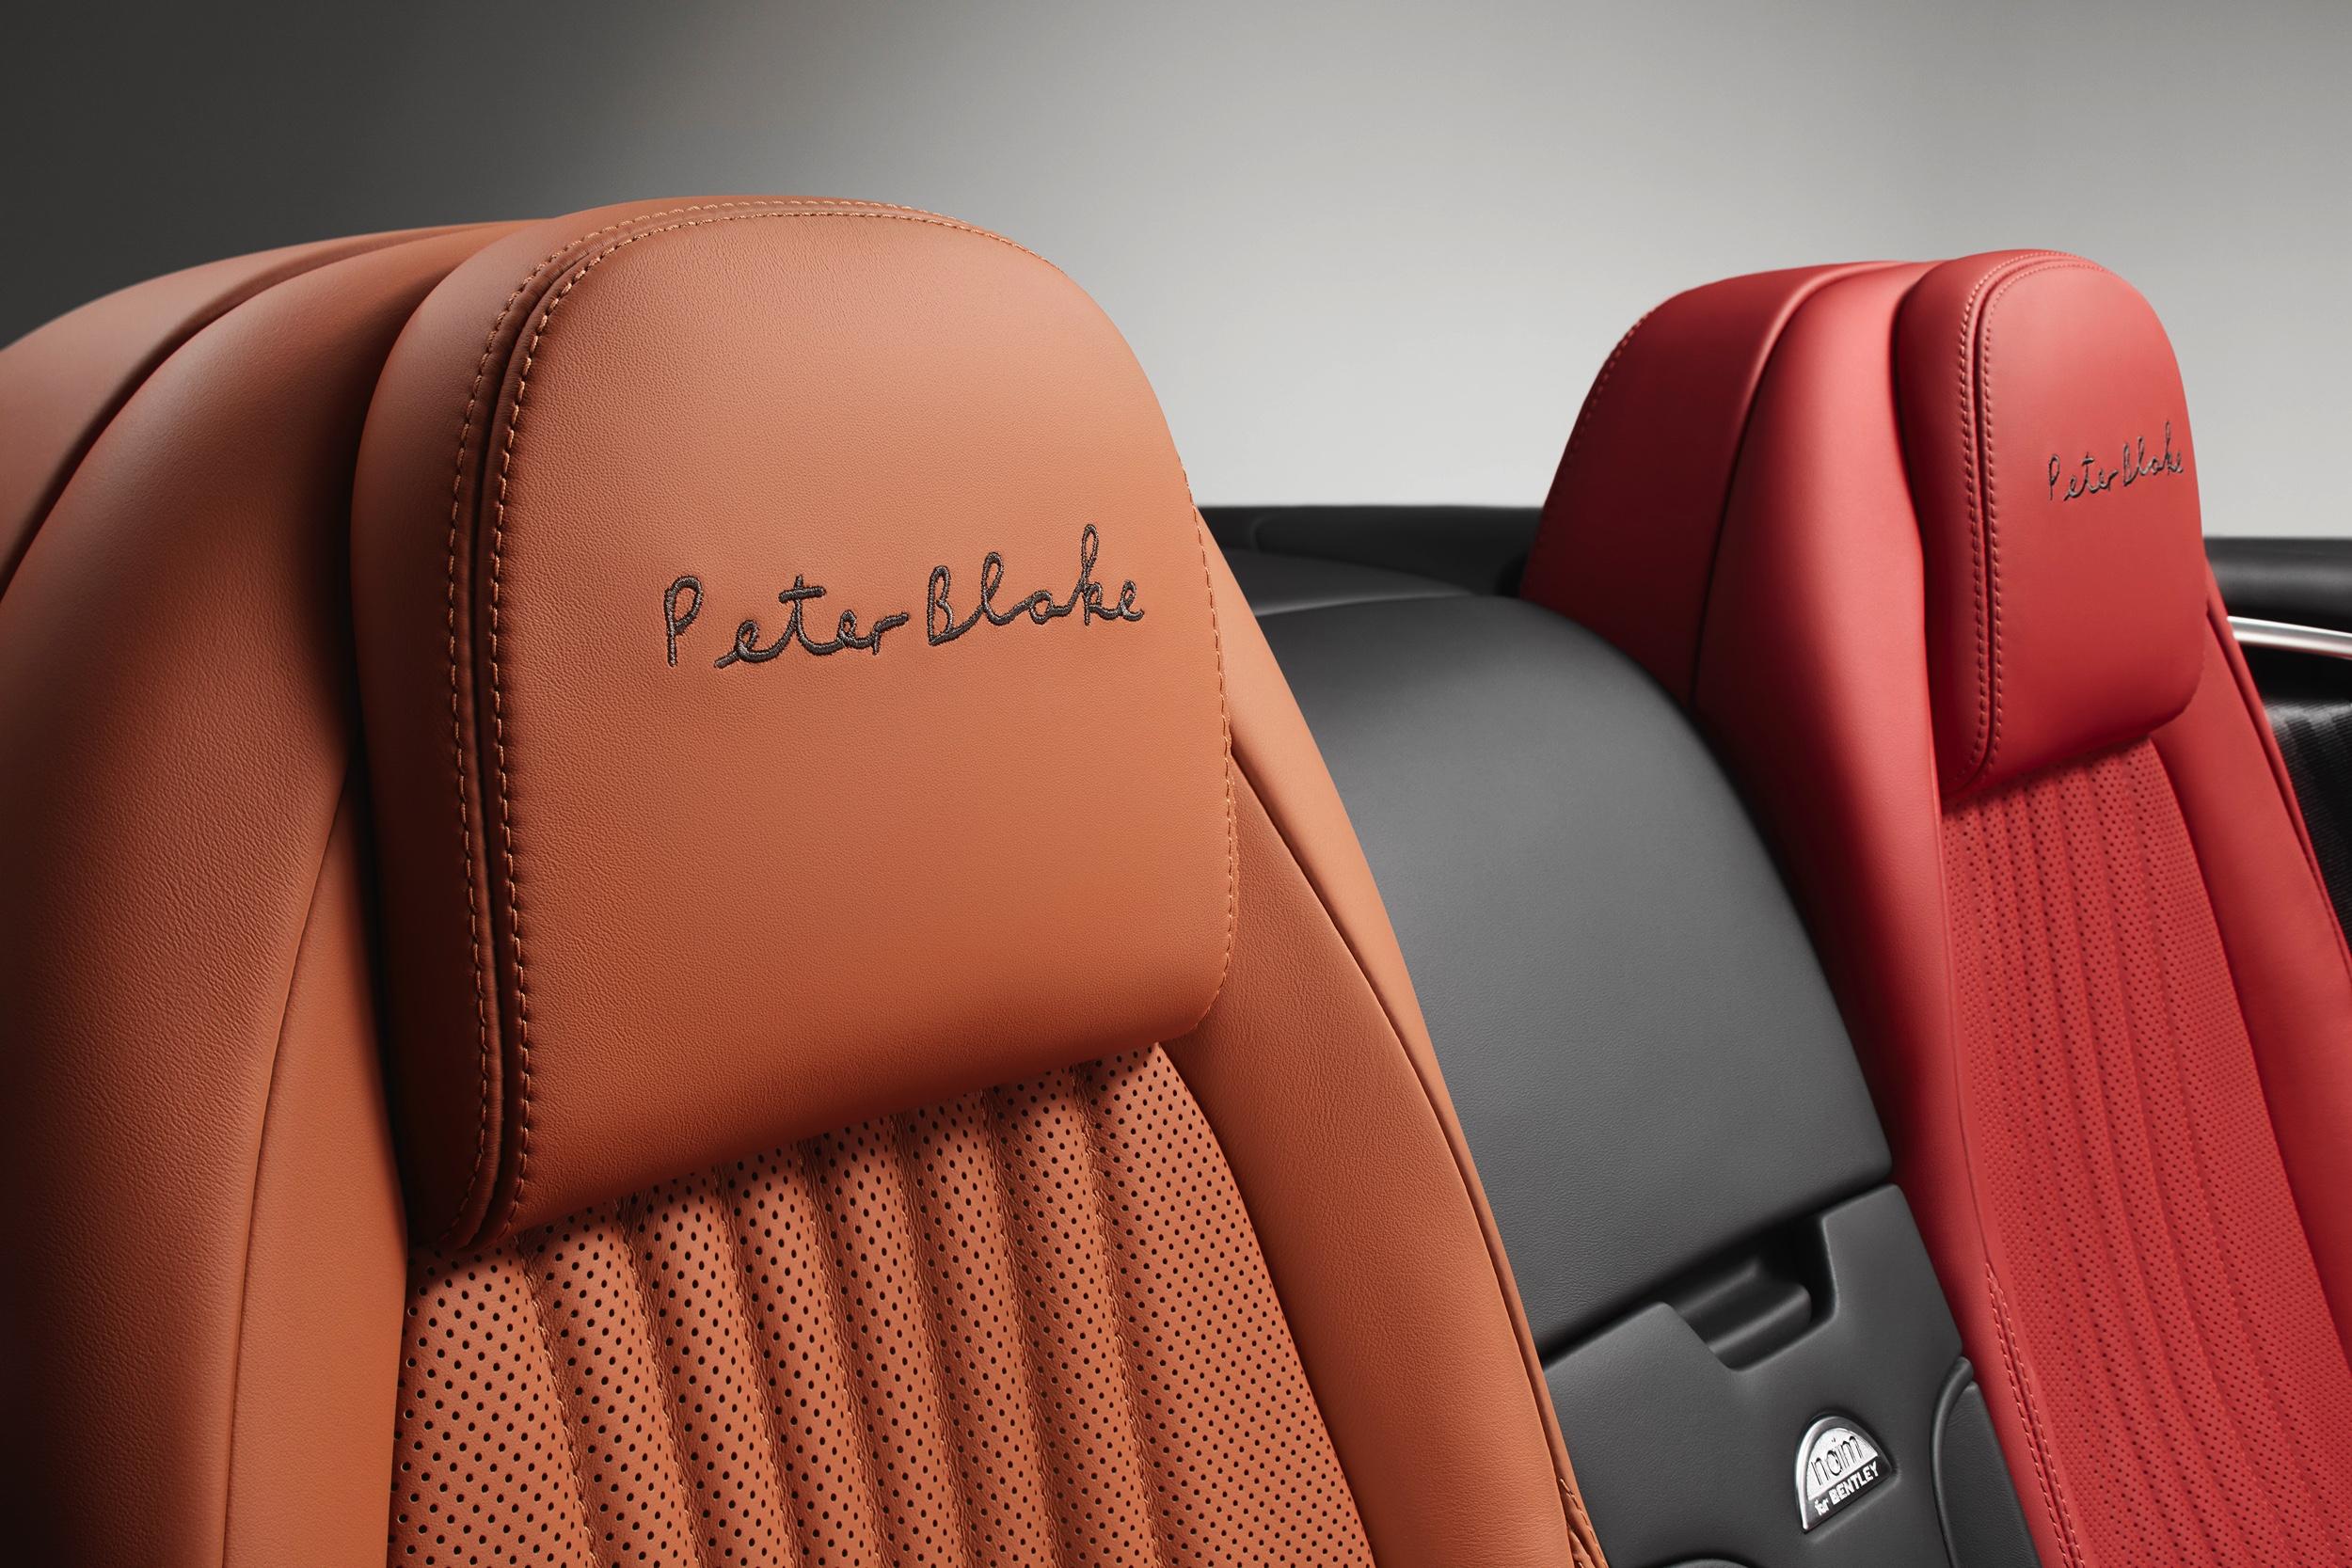 Bentley Continental by Peter Blake -5- Autovisie.nl